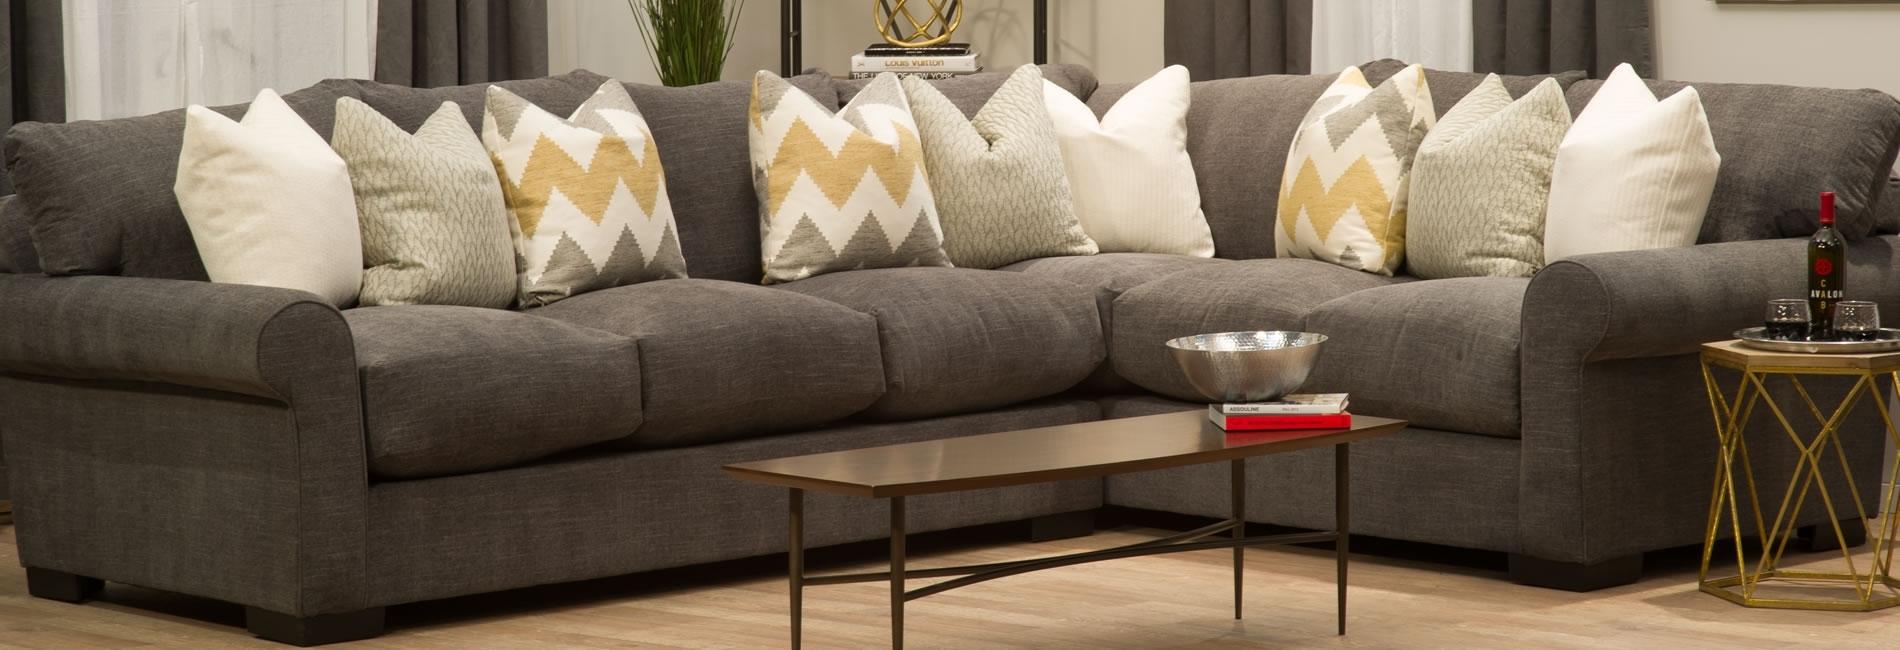 Fancy Sectional Sofas Atlanta 71 Sofa Room Ideas With Sectional In Sectional Sofas At Atlanta (Image 3 of 10)